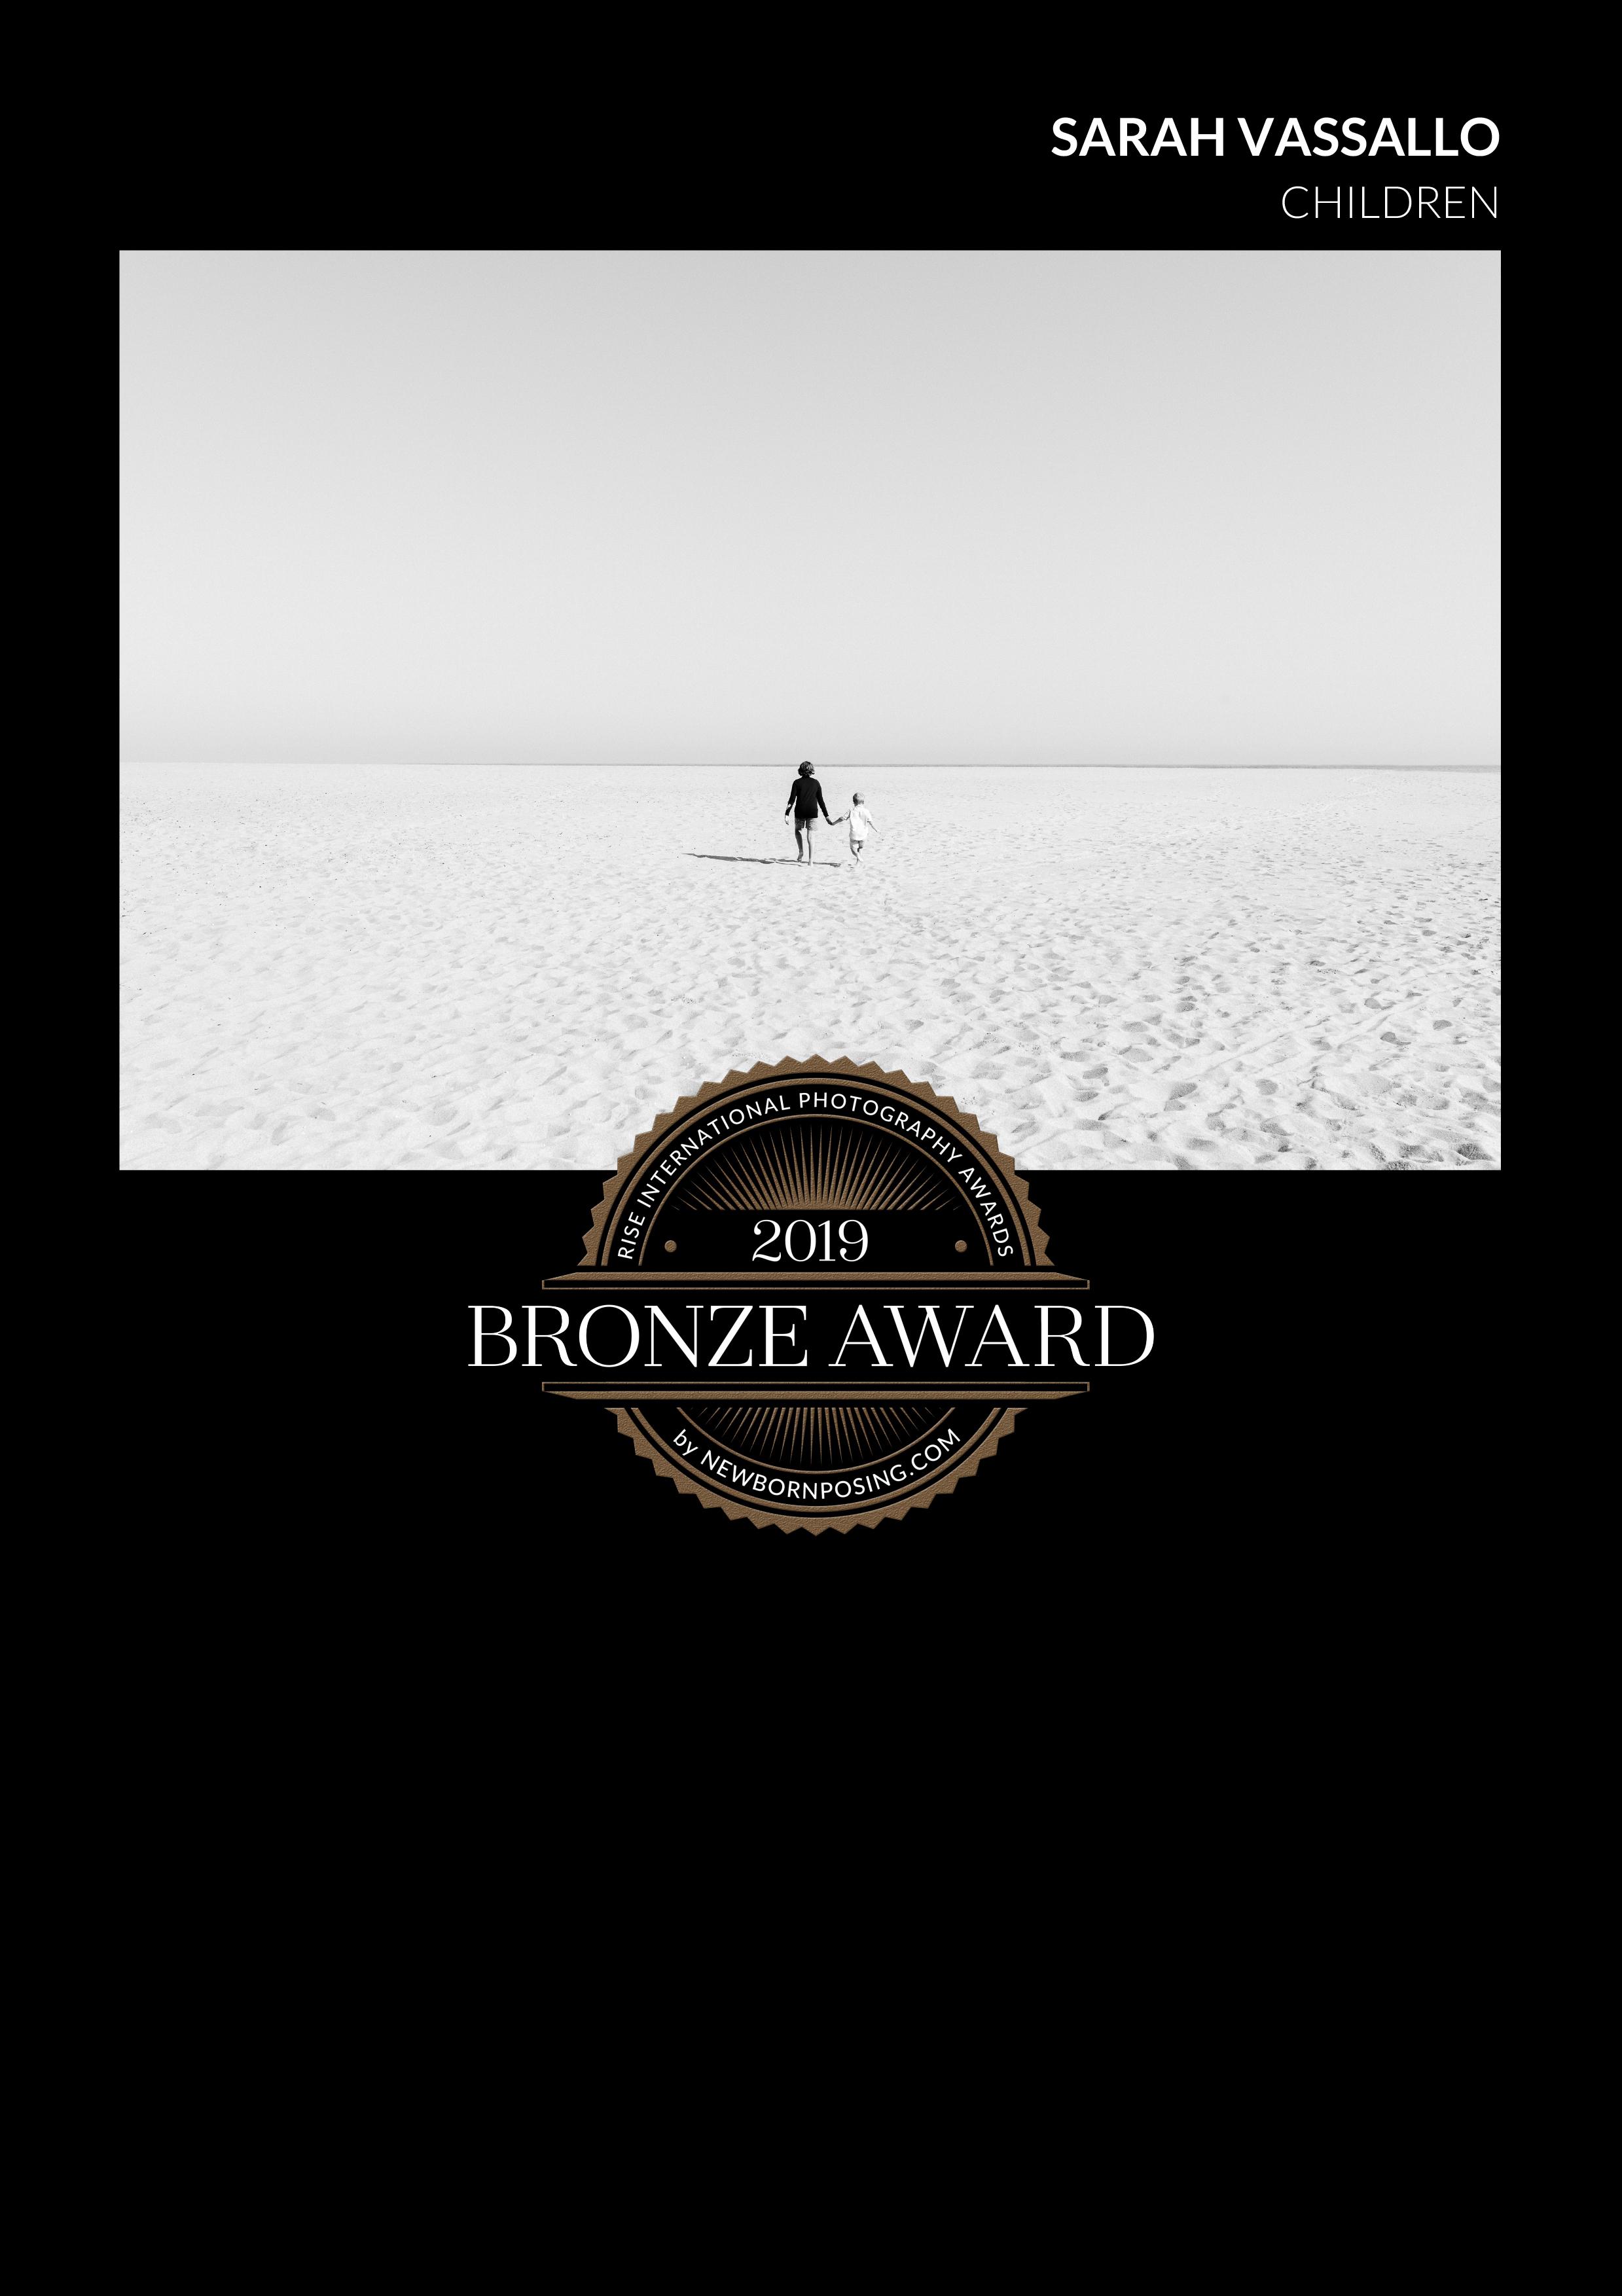 Sutherland Shire Children's Photographer Sevenish Photography wins bronze award in Rise International Photography Awards